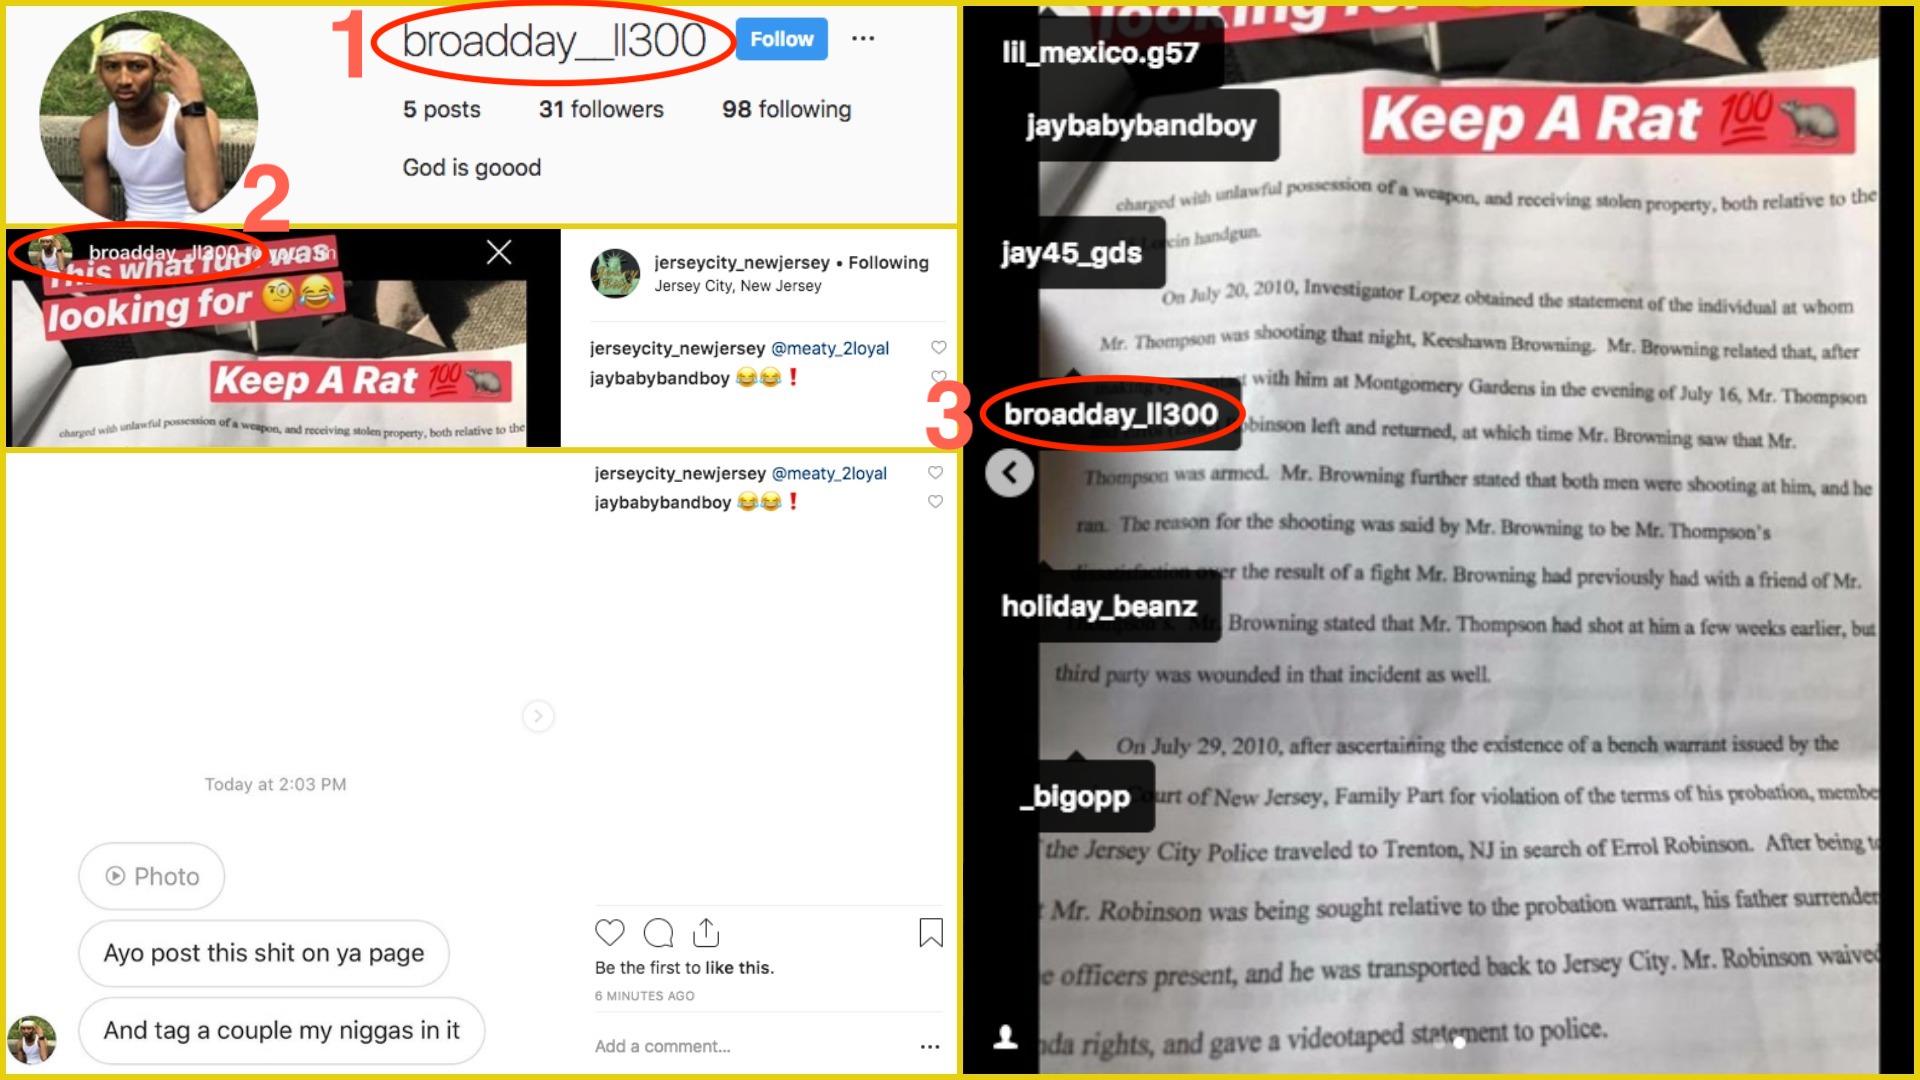 JerseyCity_NewJersey - Keeshawn Browning statement - Jalil Holmes